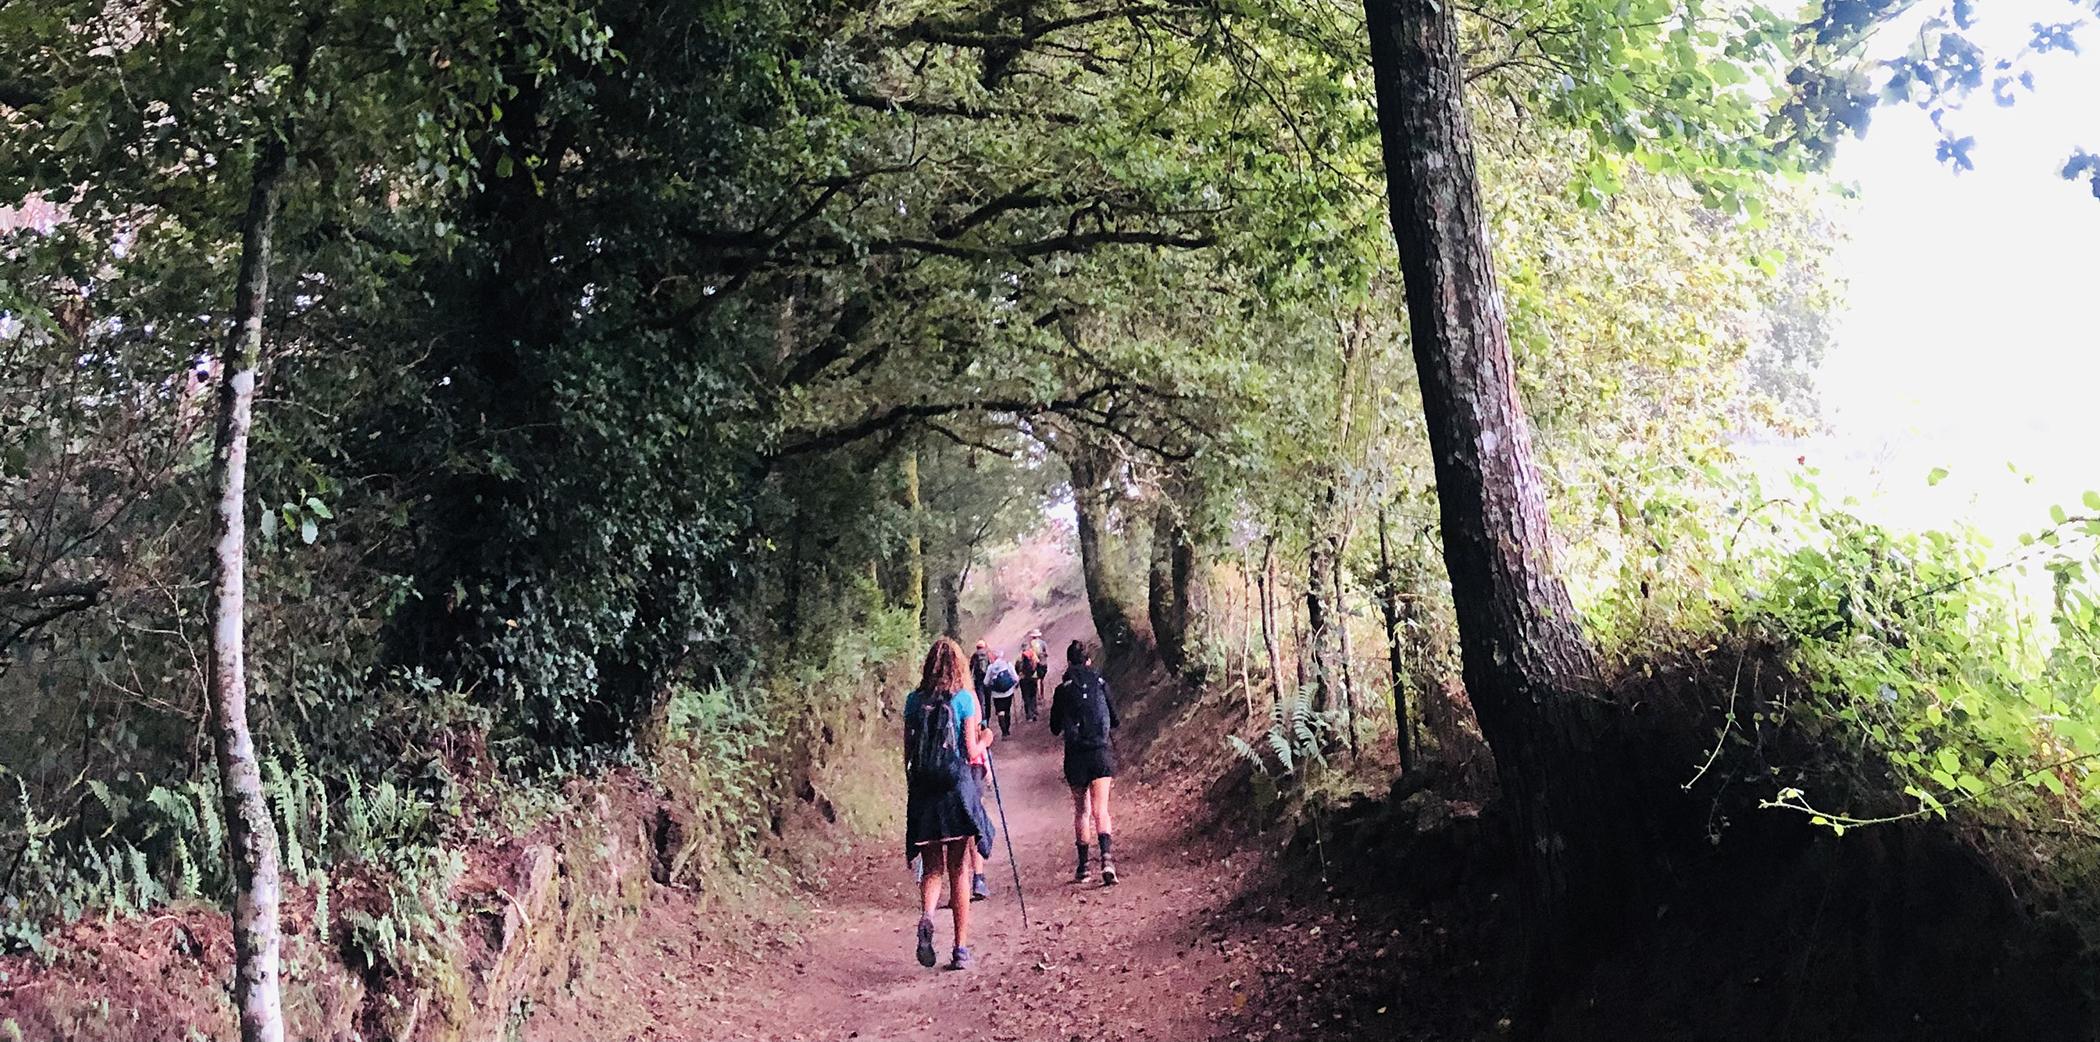 Peregrinos en un bosque entre Palas de Rei y Ribadixo de Baixo